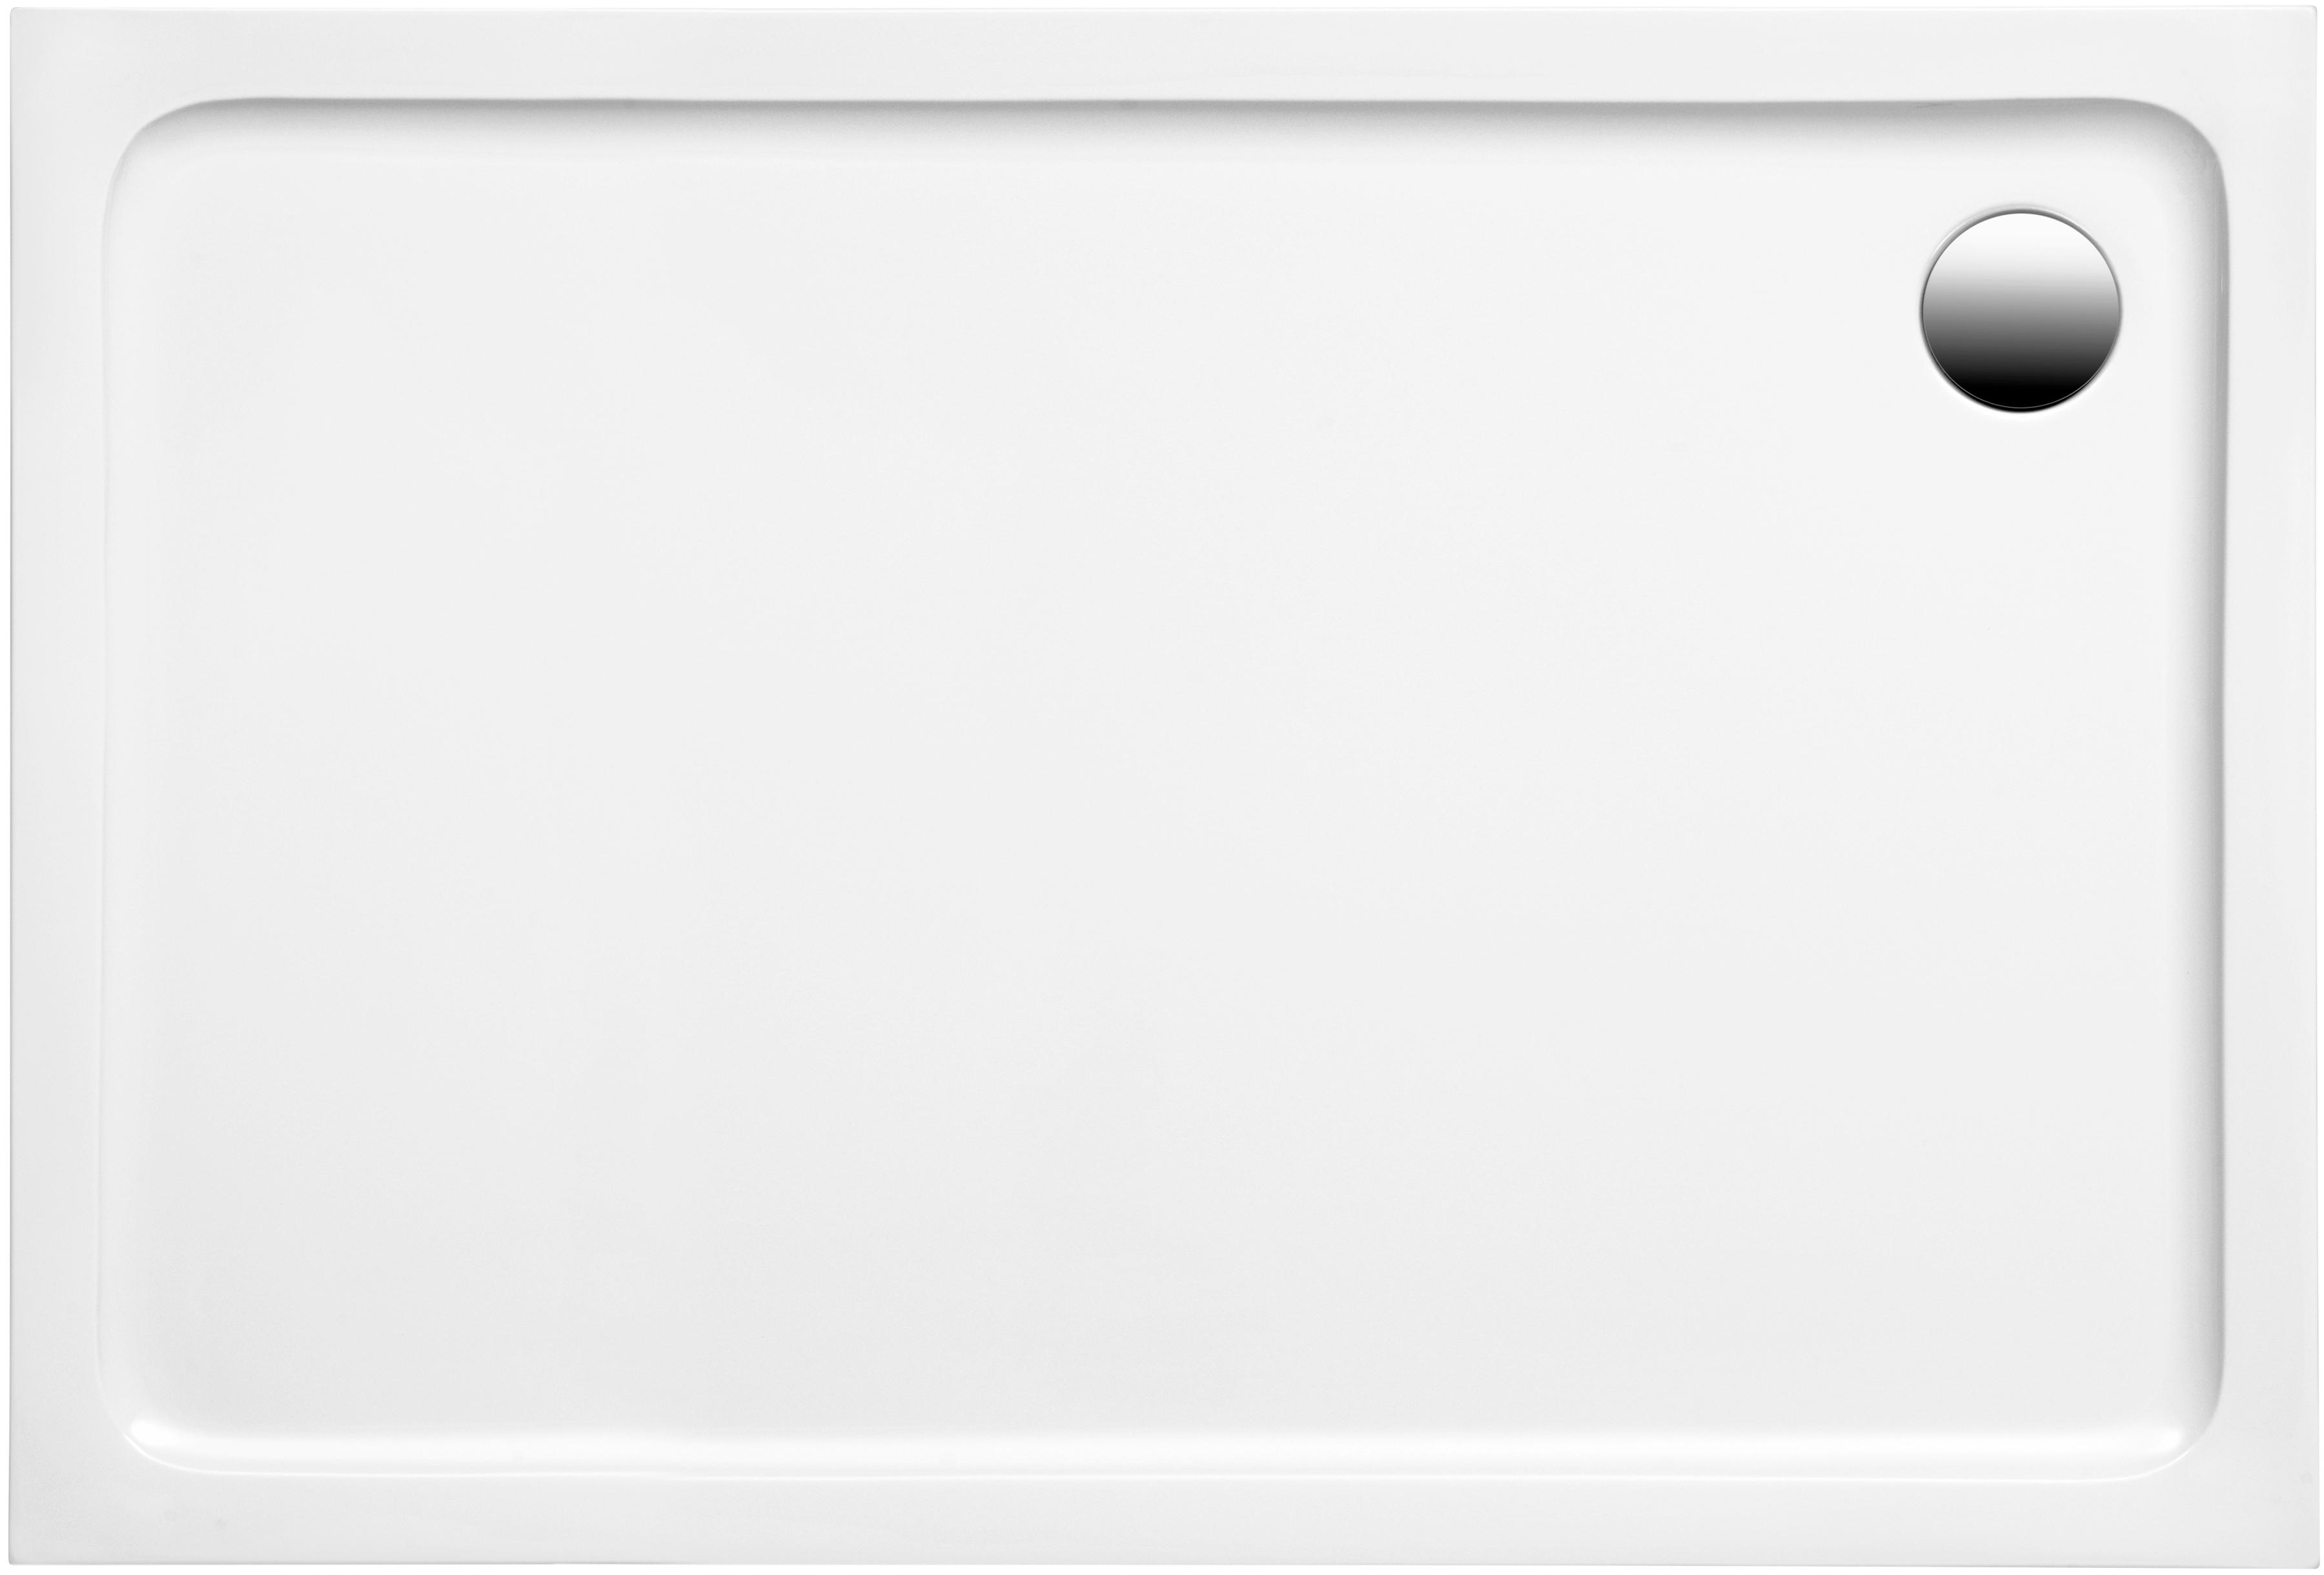 OTTOFOND Duschwanne Set Rechteckduschwanne, 1400x800/30 mm weiß Duschwannen Duschen Bad Sanitär